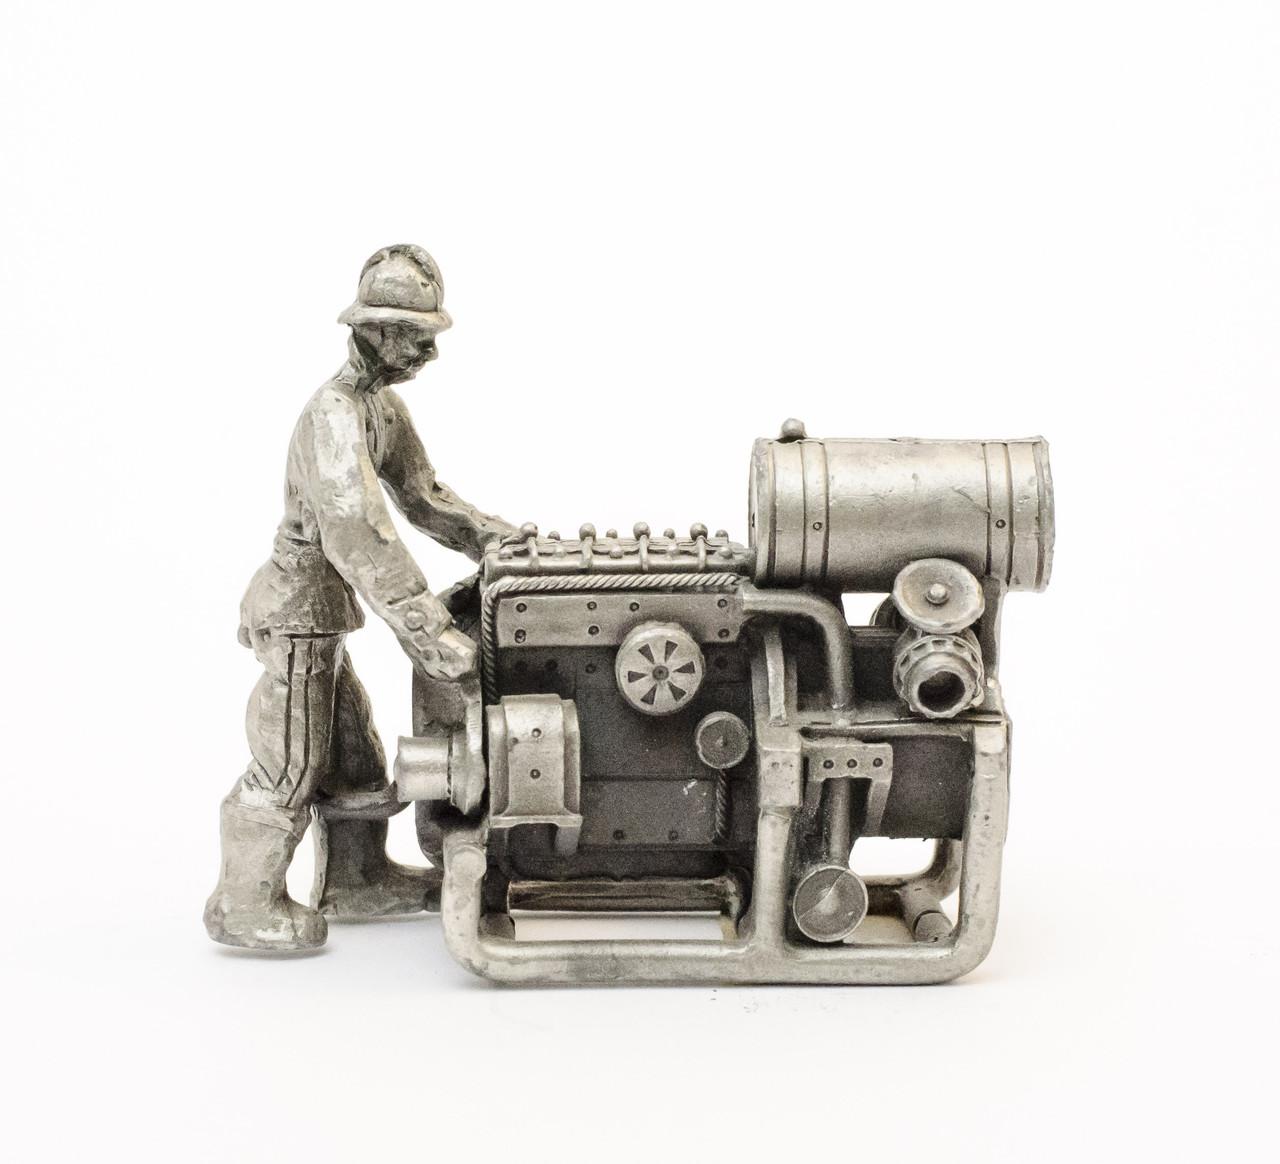 Скульптура миниатюра, станочник, олово, Germany